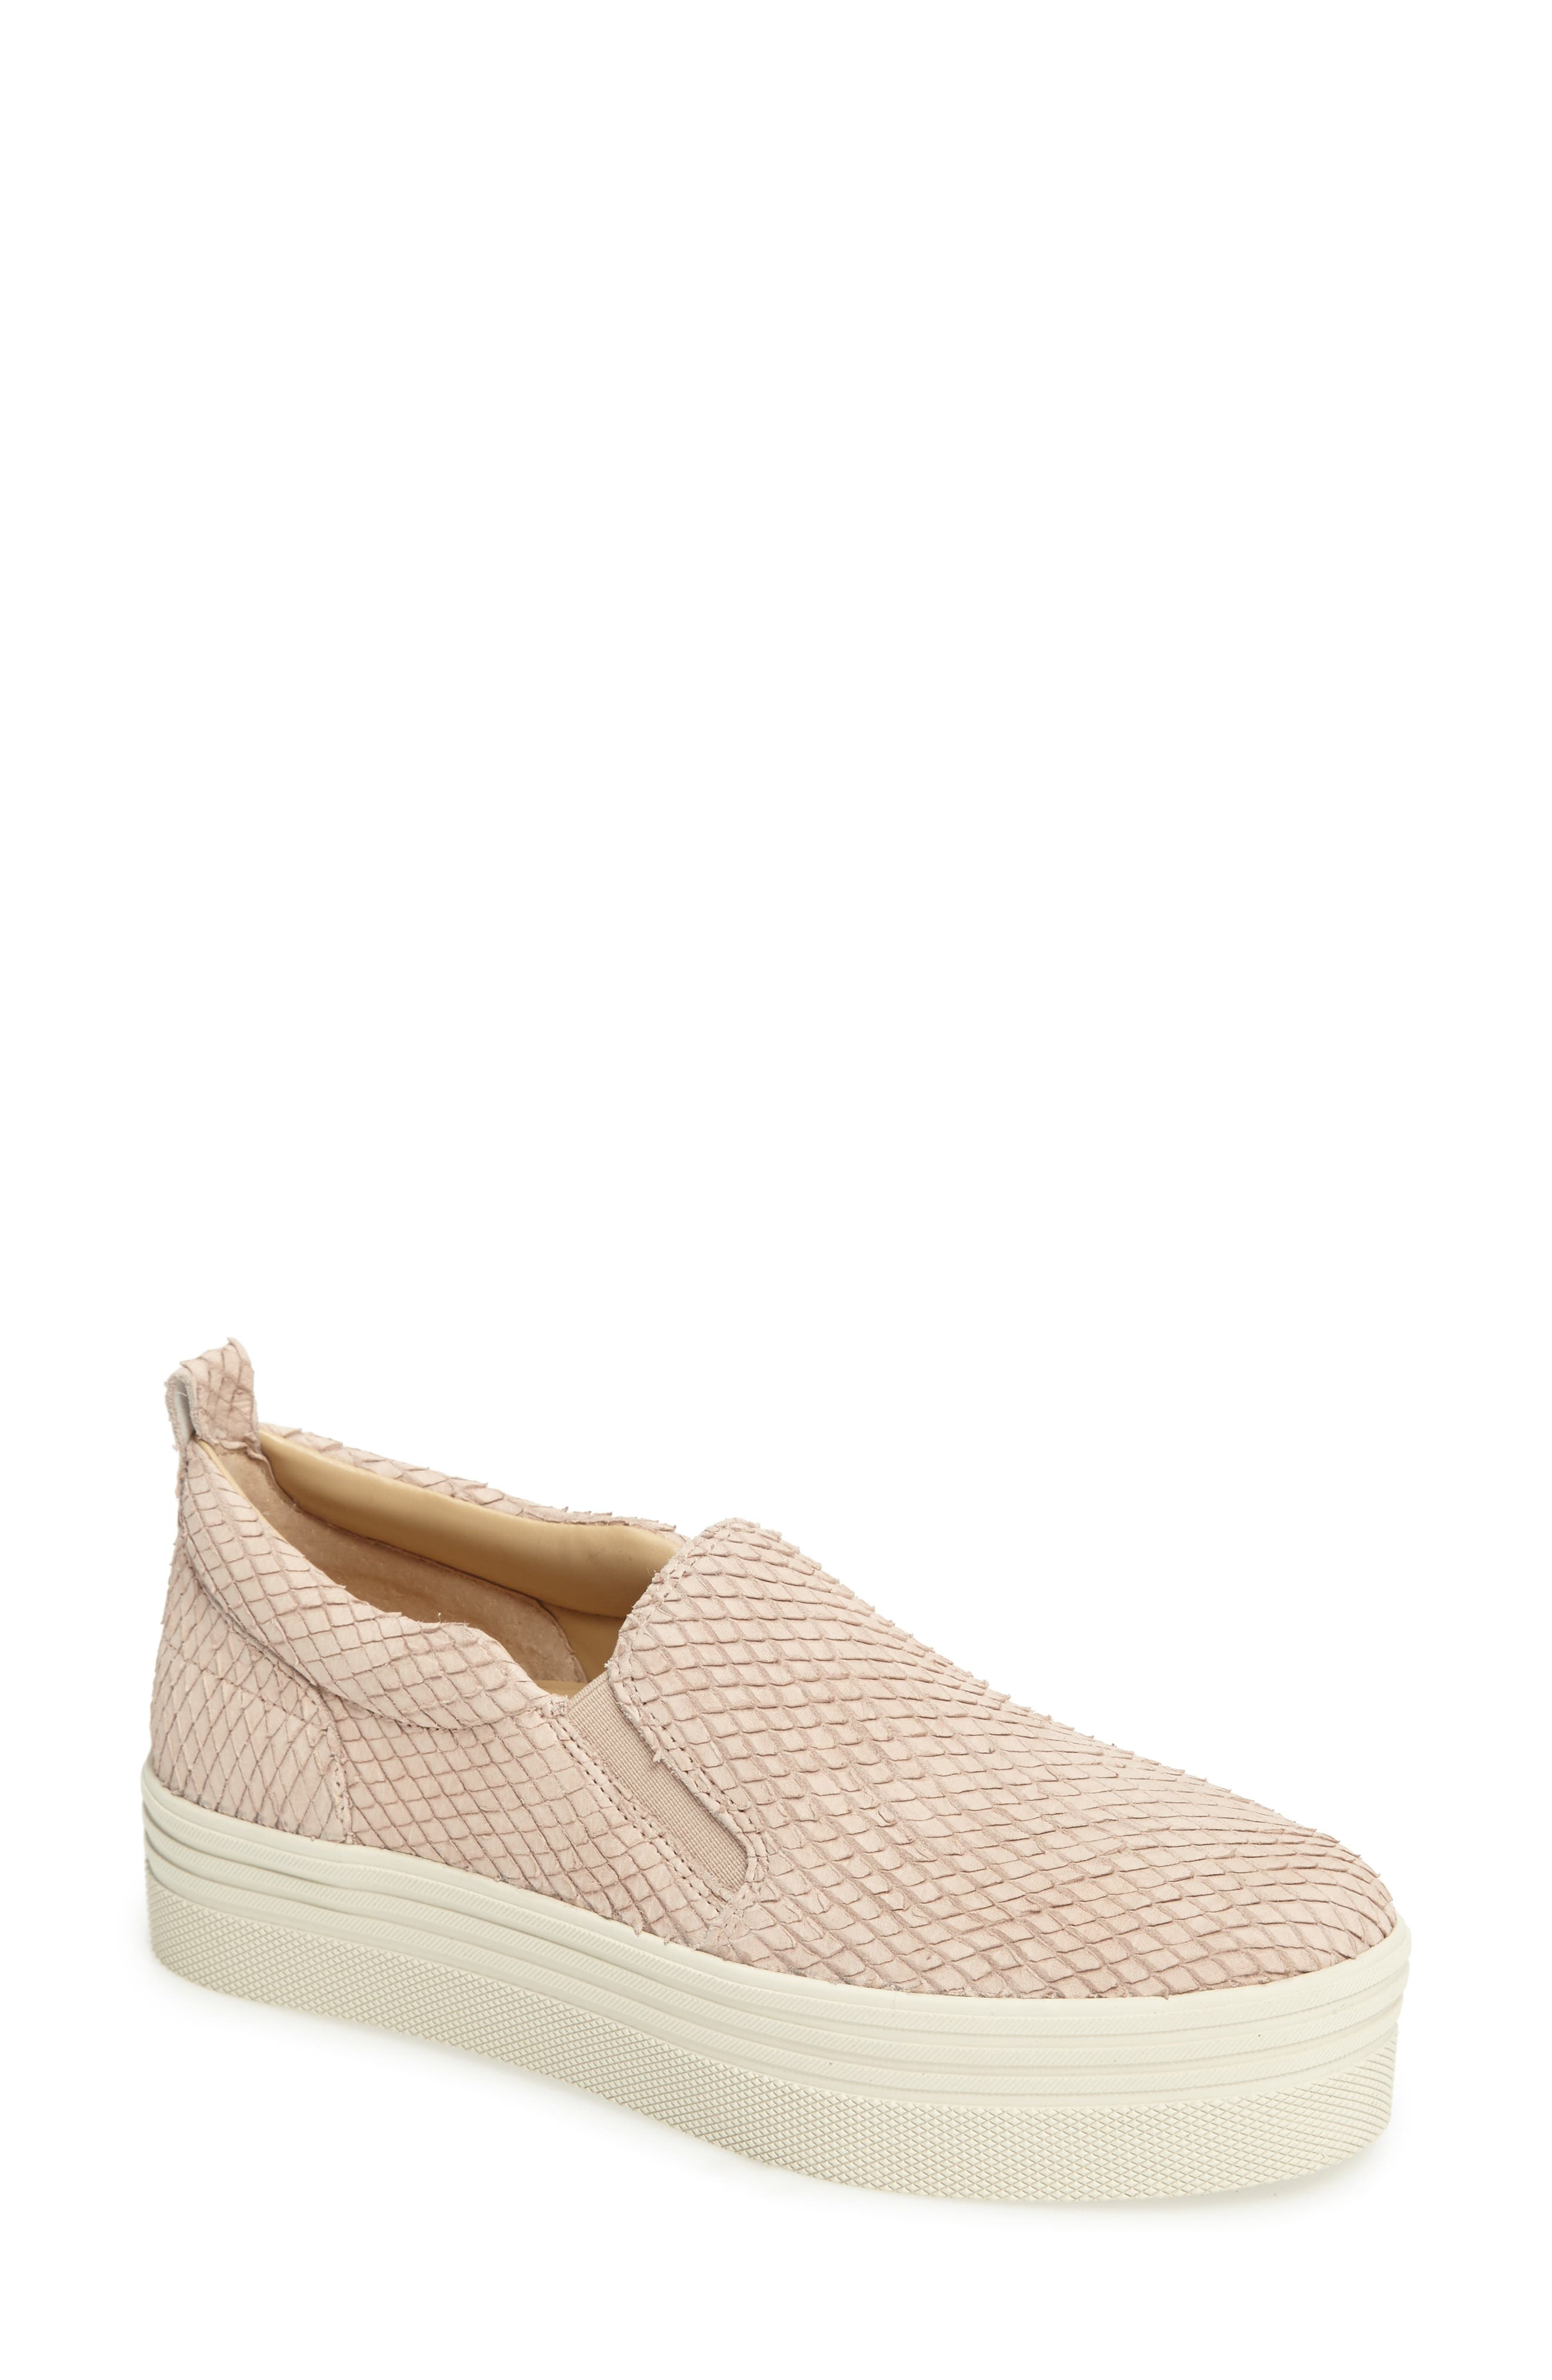 Alternate Image 1 Selected - Marc Fisher LTD Elise Platform Sneaker (Women)